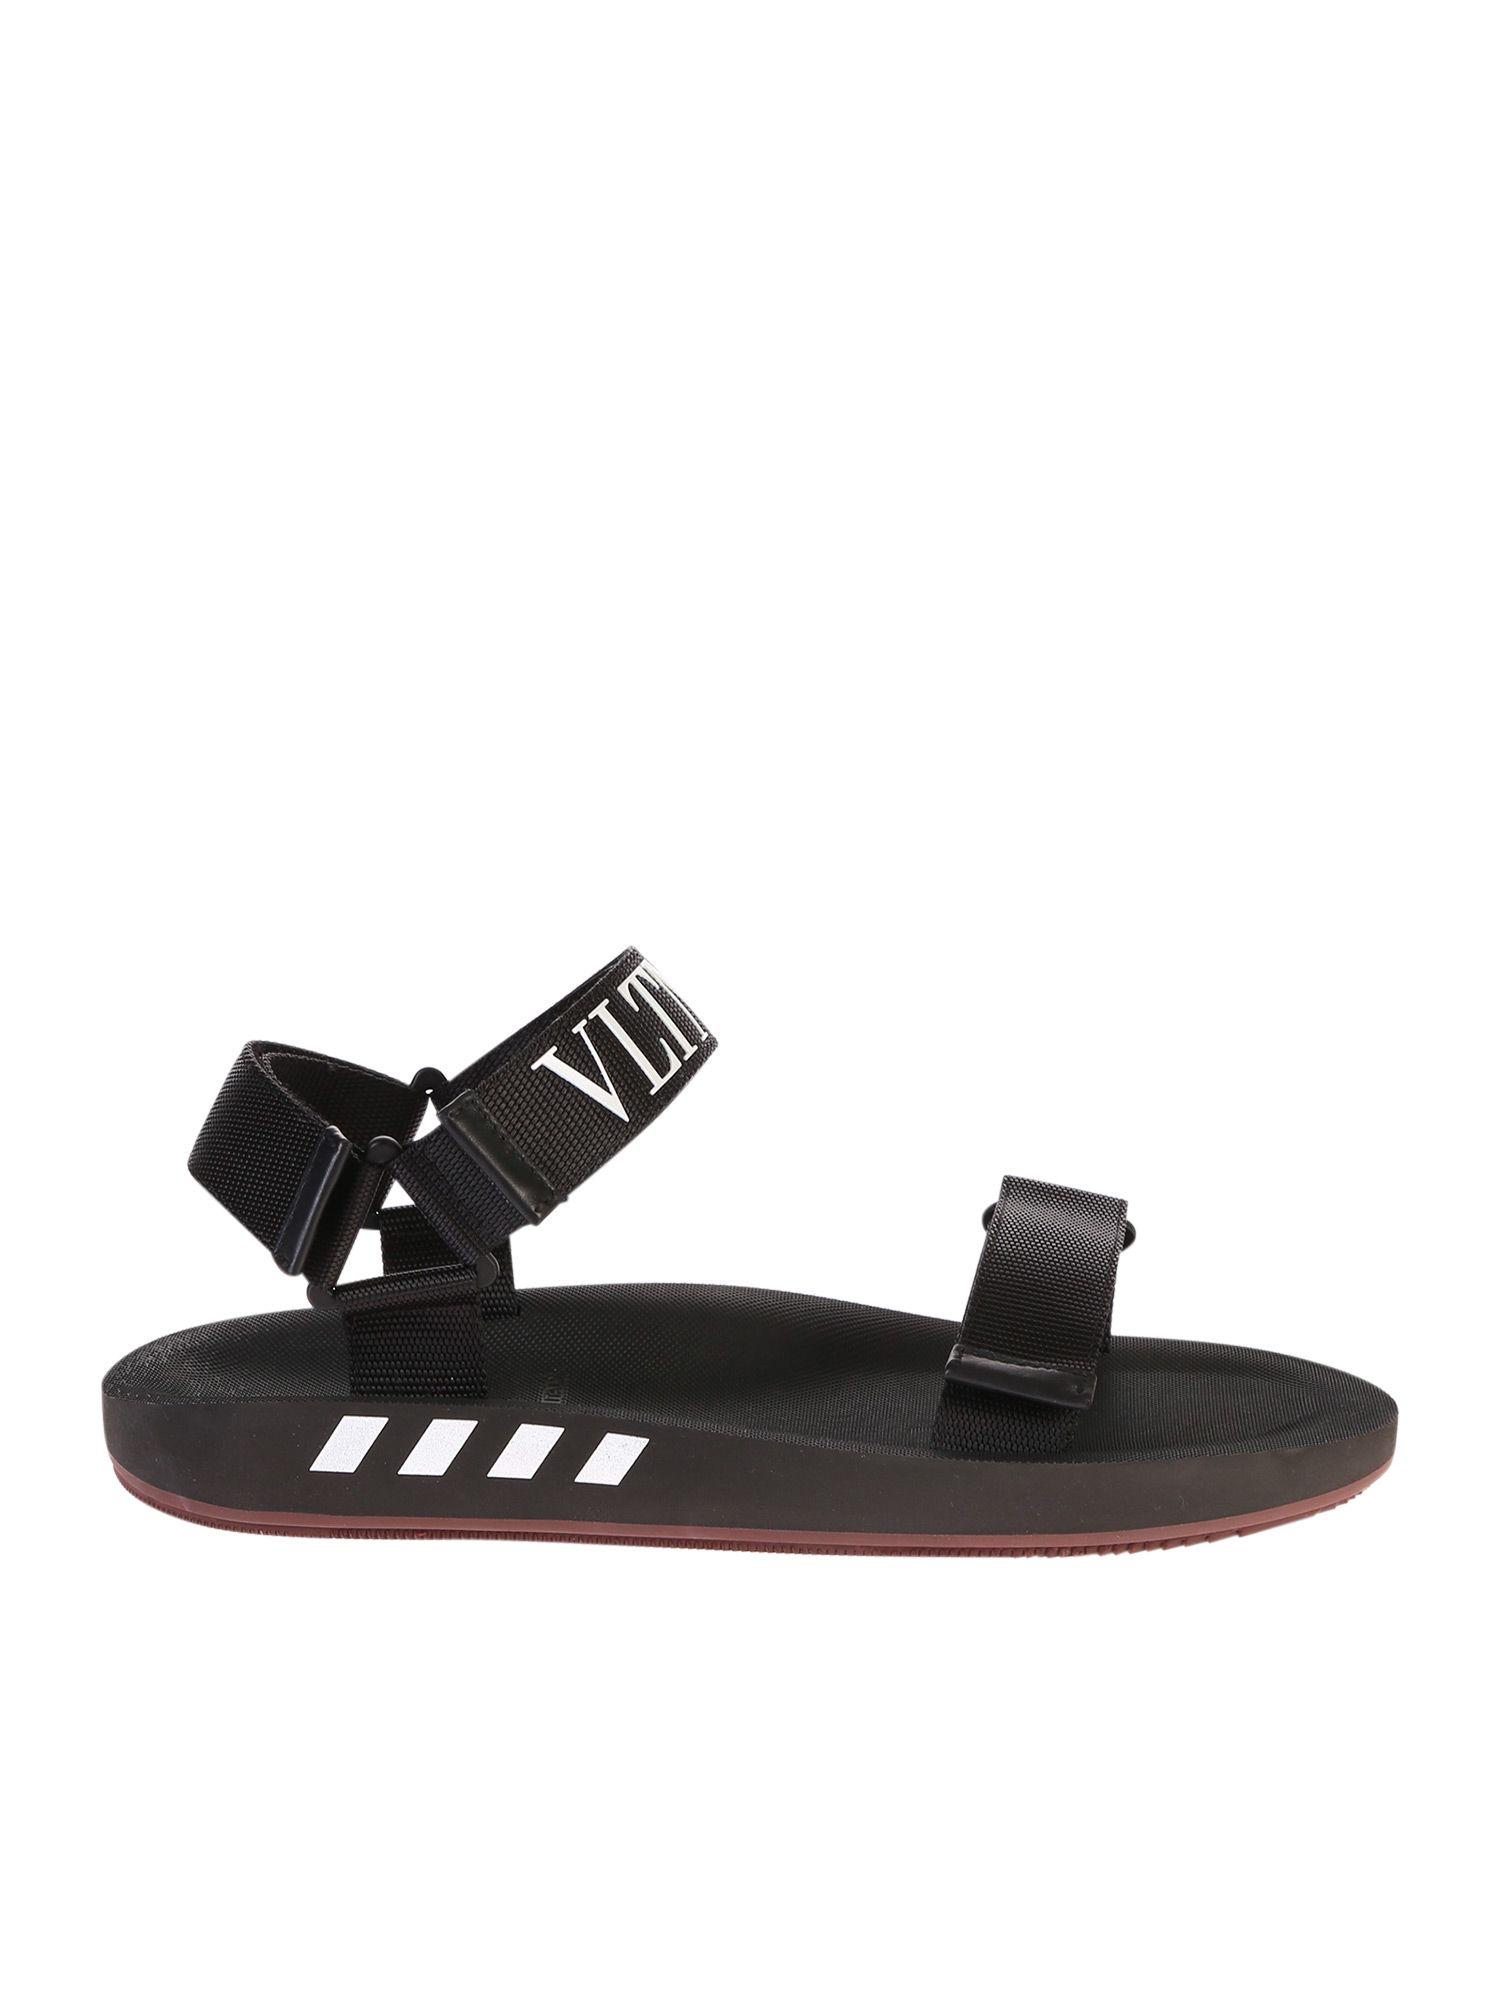 Valentino Garavani Branded Sandals